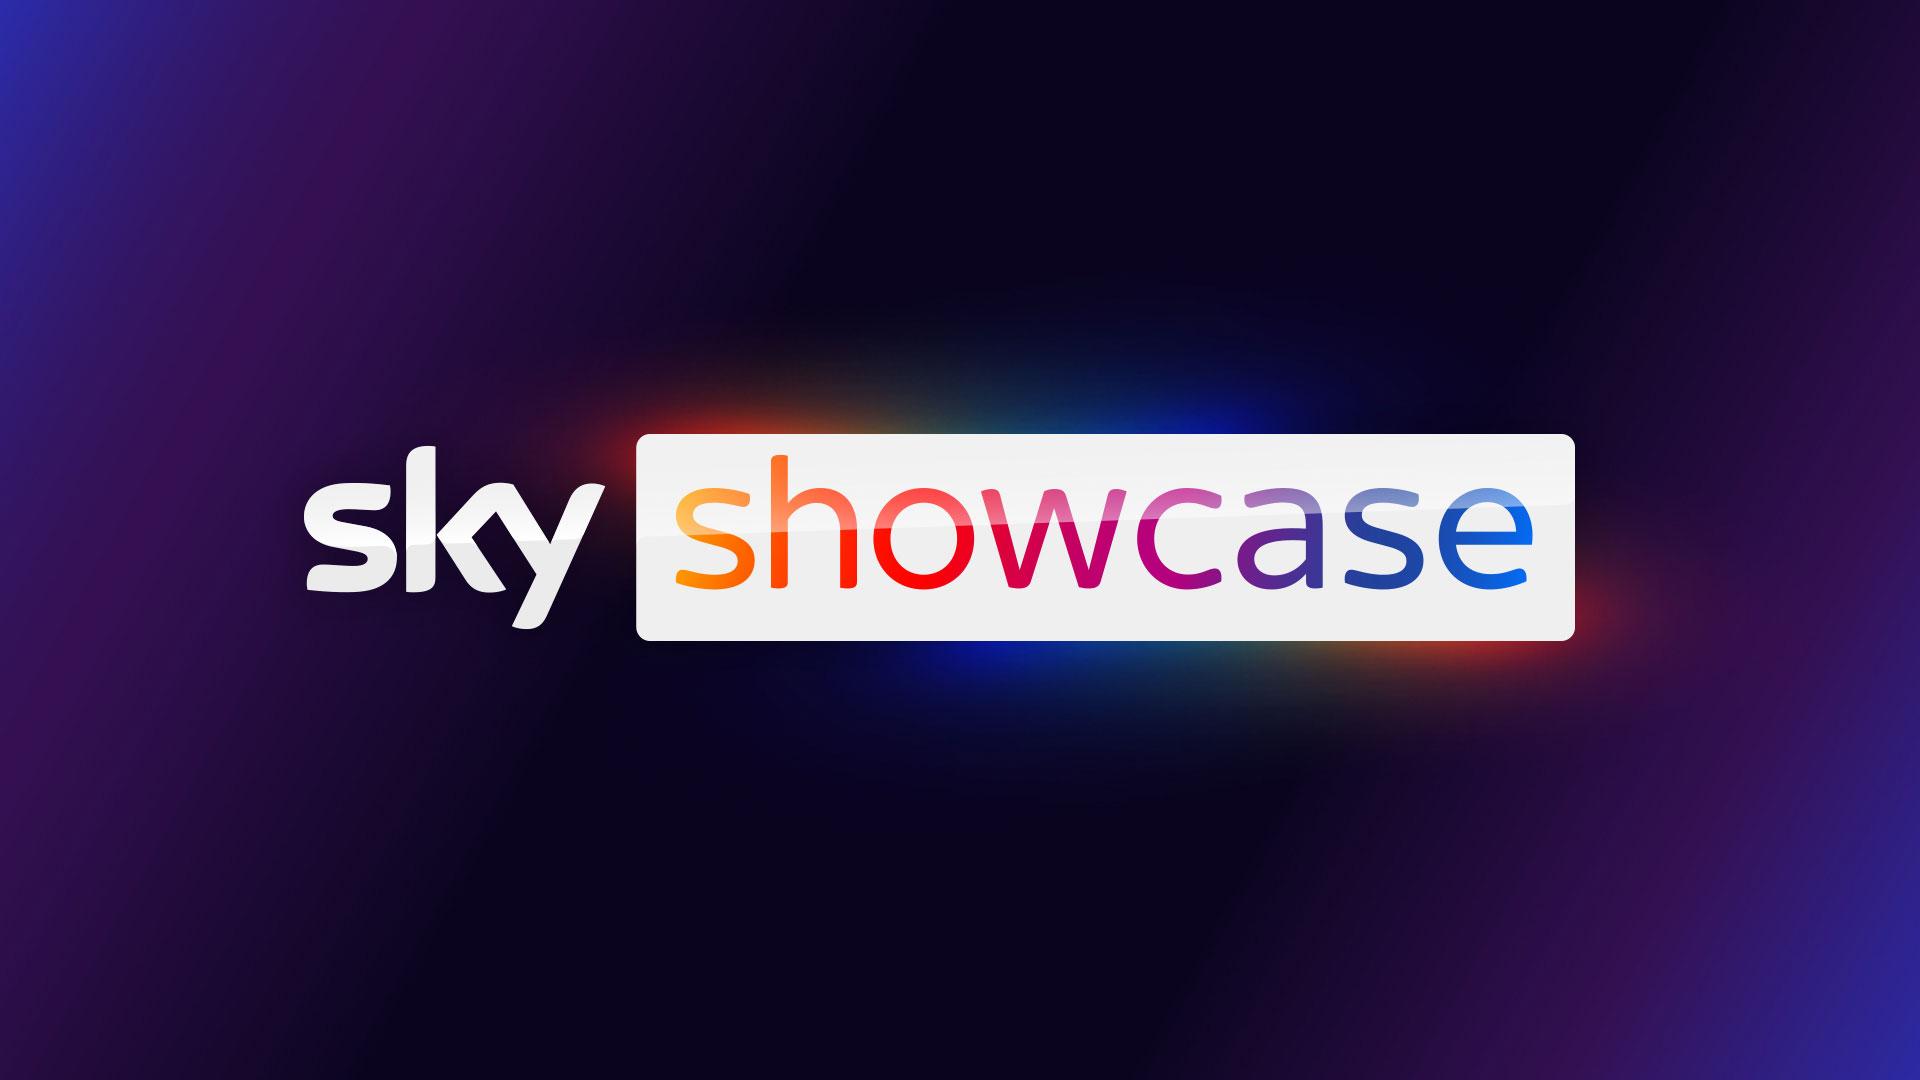 Sky makes changes to entertainment portfolio unveiling Sky Showcase & Sky Max